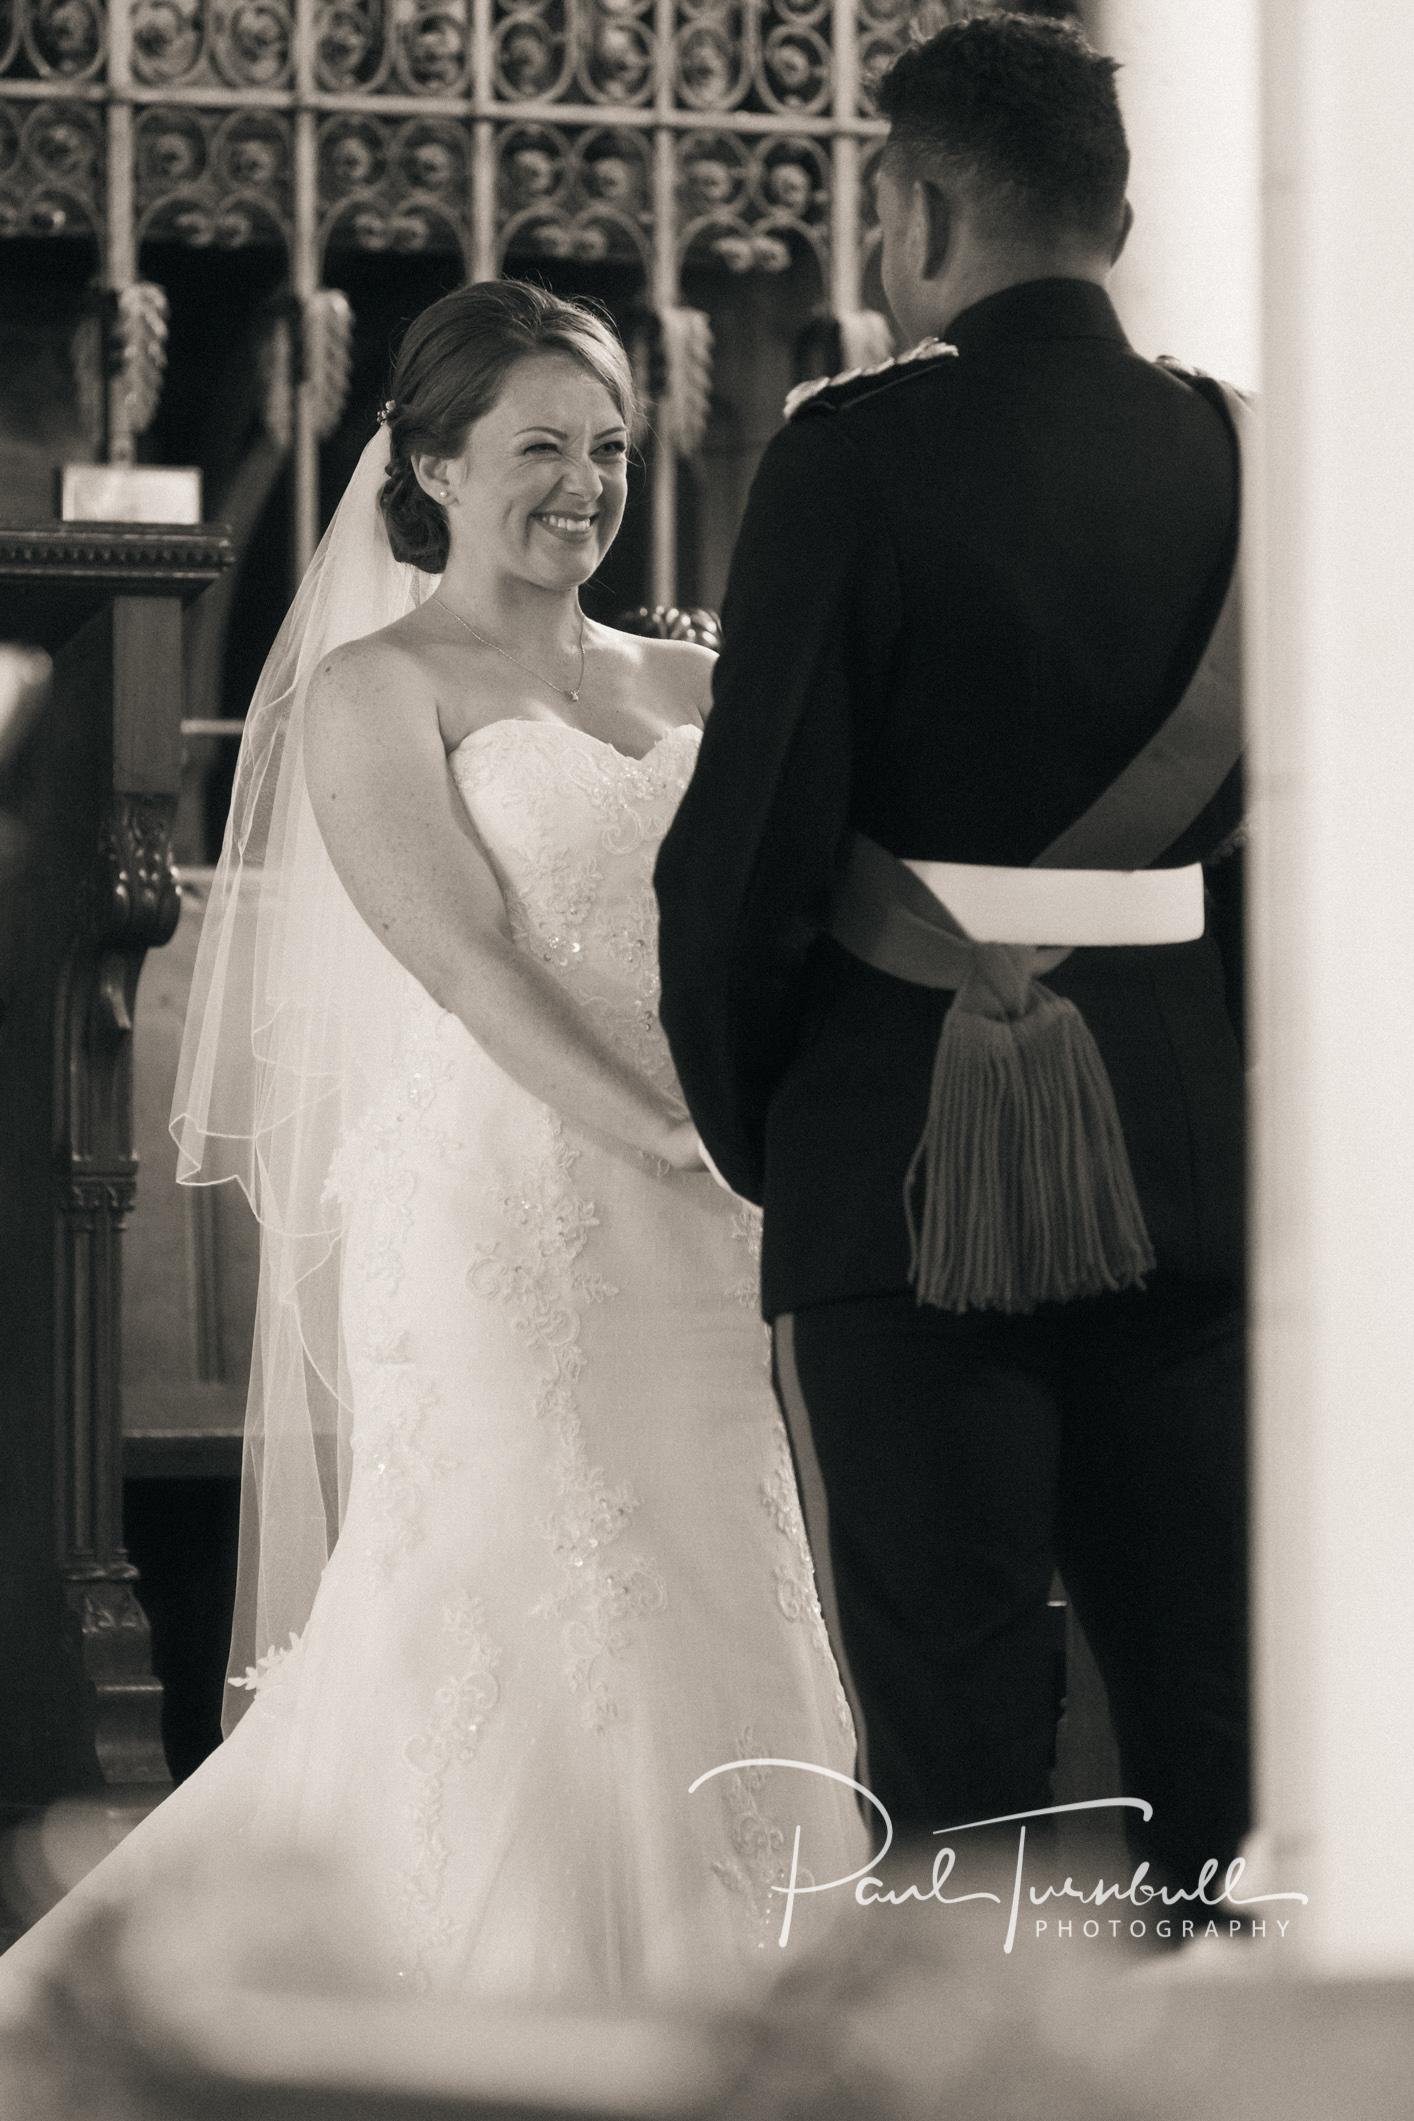 wedding-photographer-south-dalton-walkington-yorkshire-emma-james-034.jpg